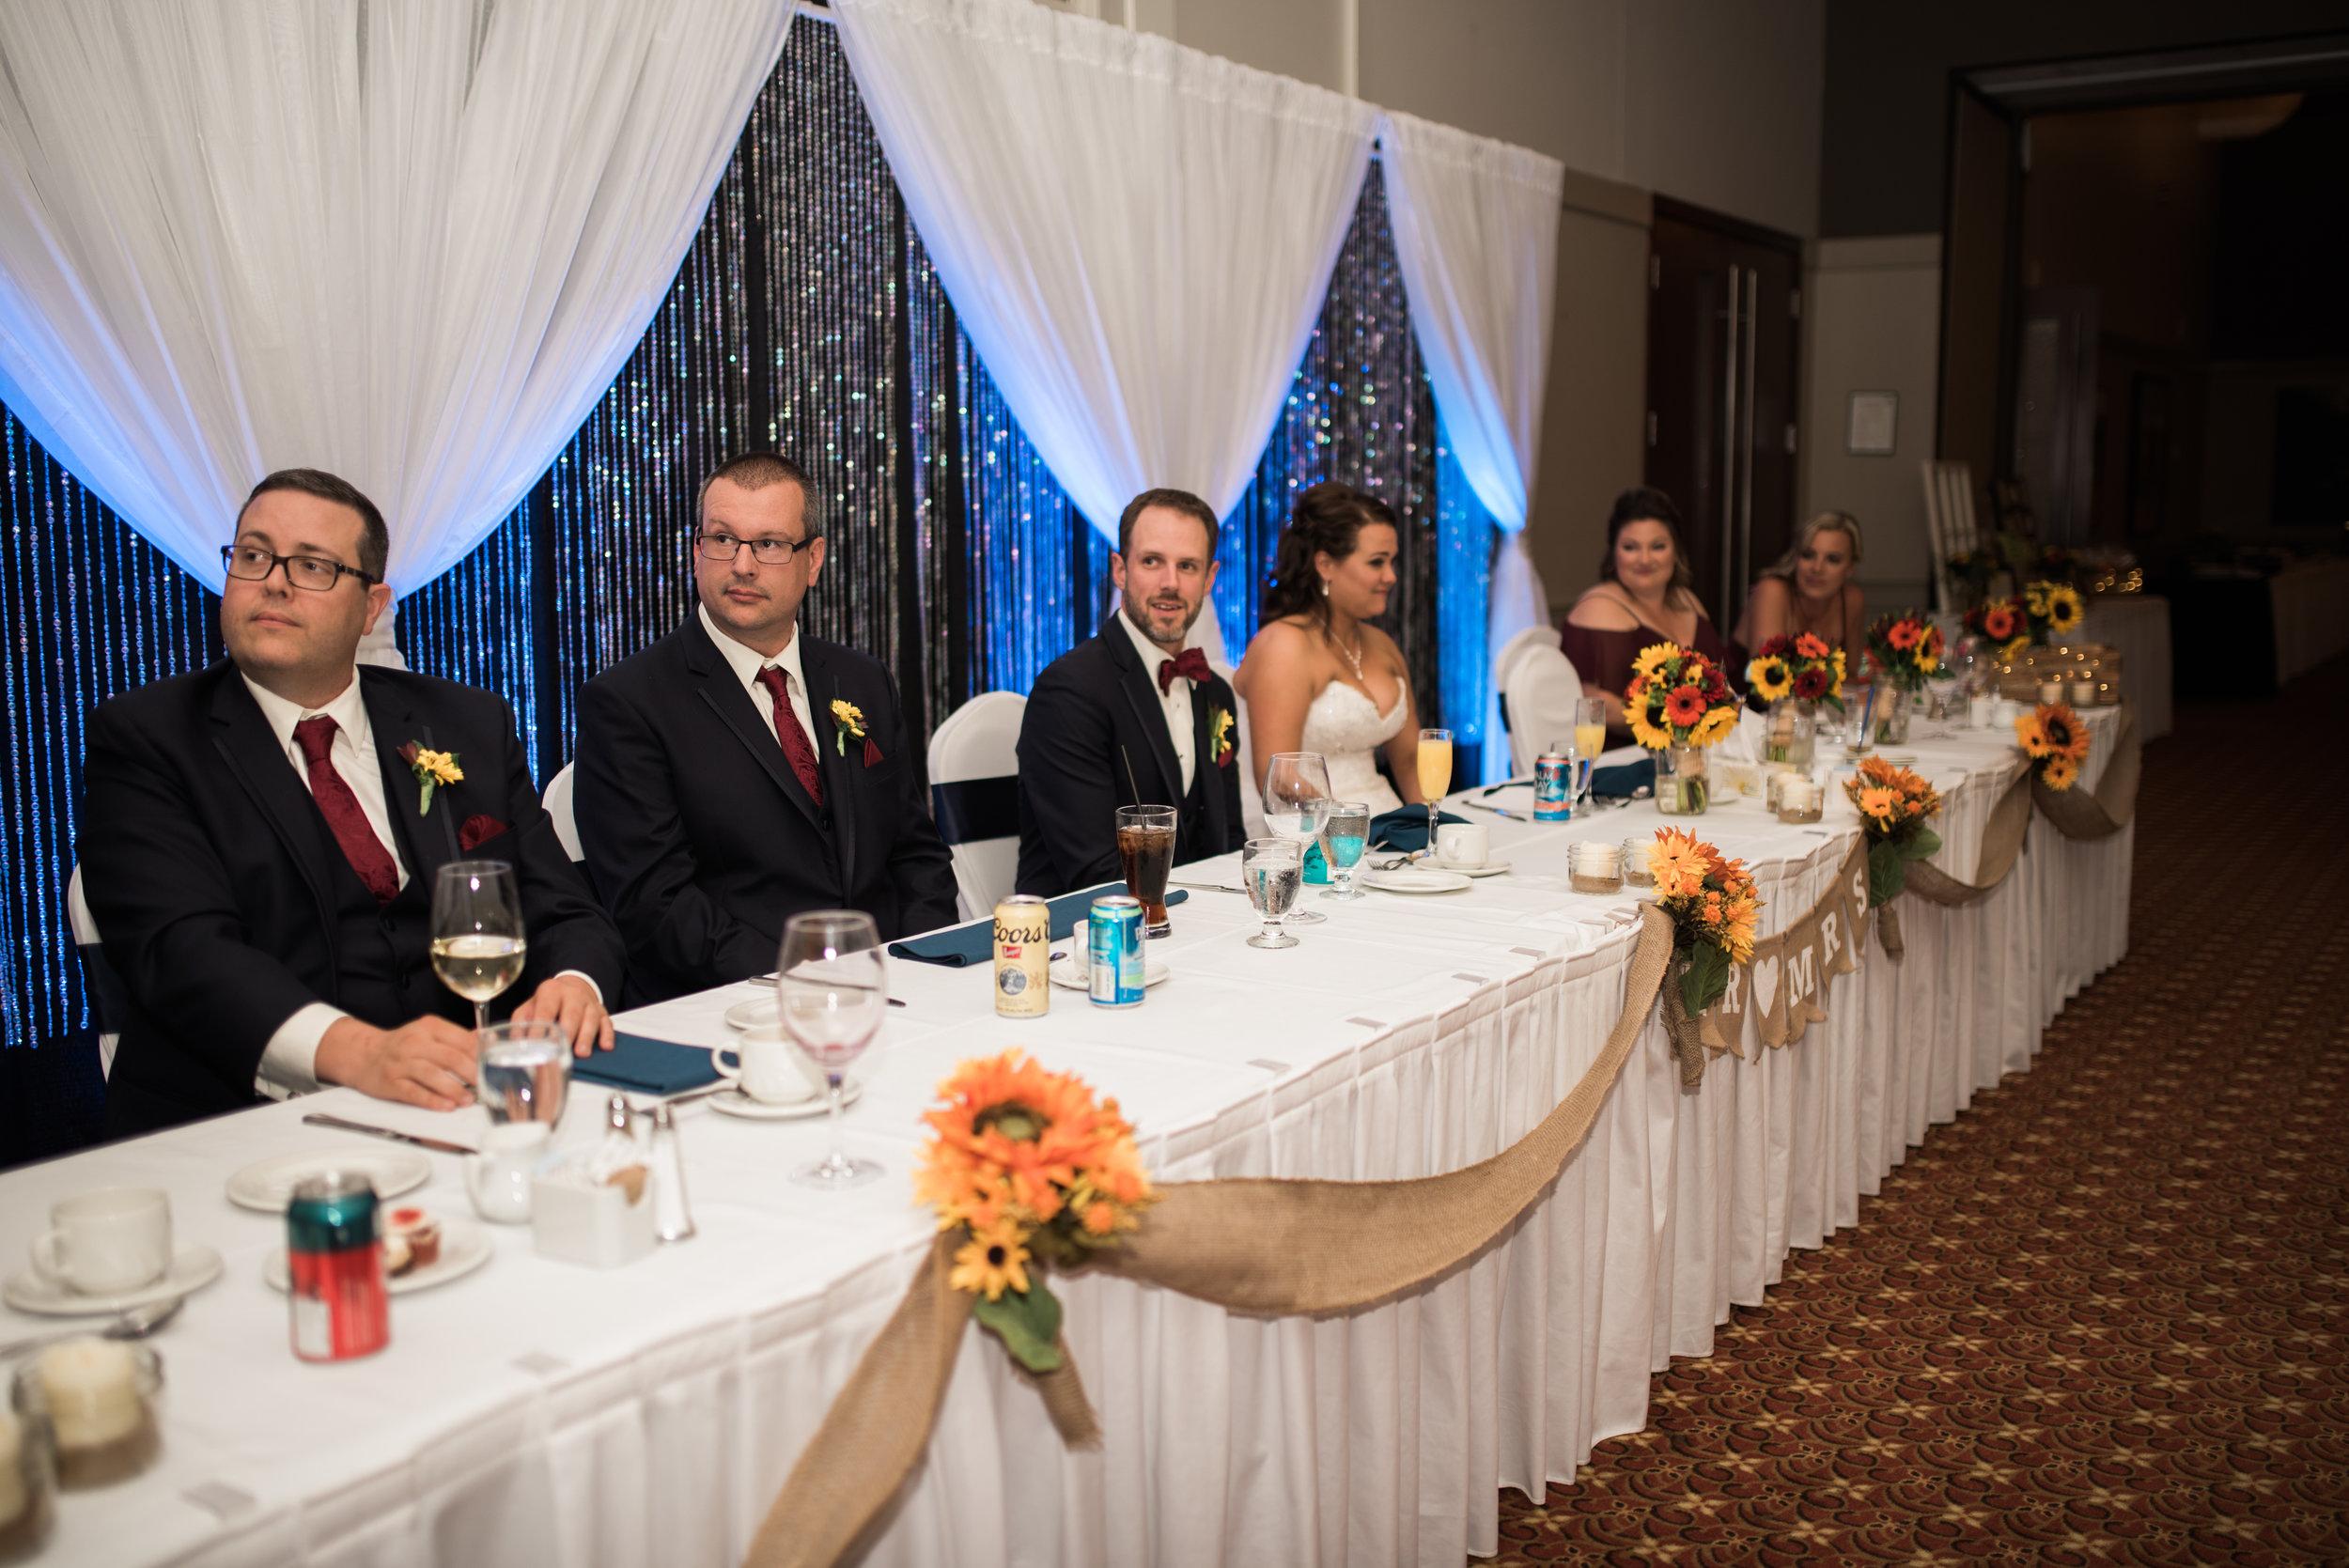 J M Wedding 3477.jpg